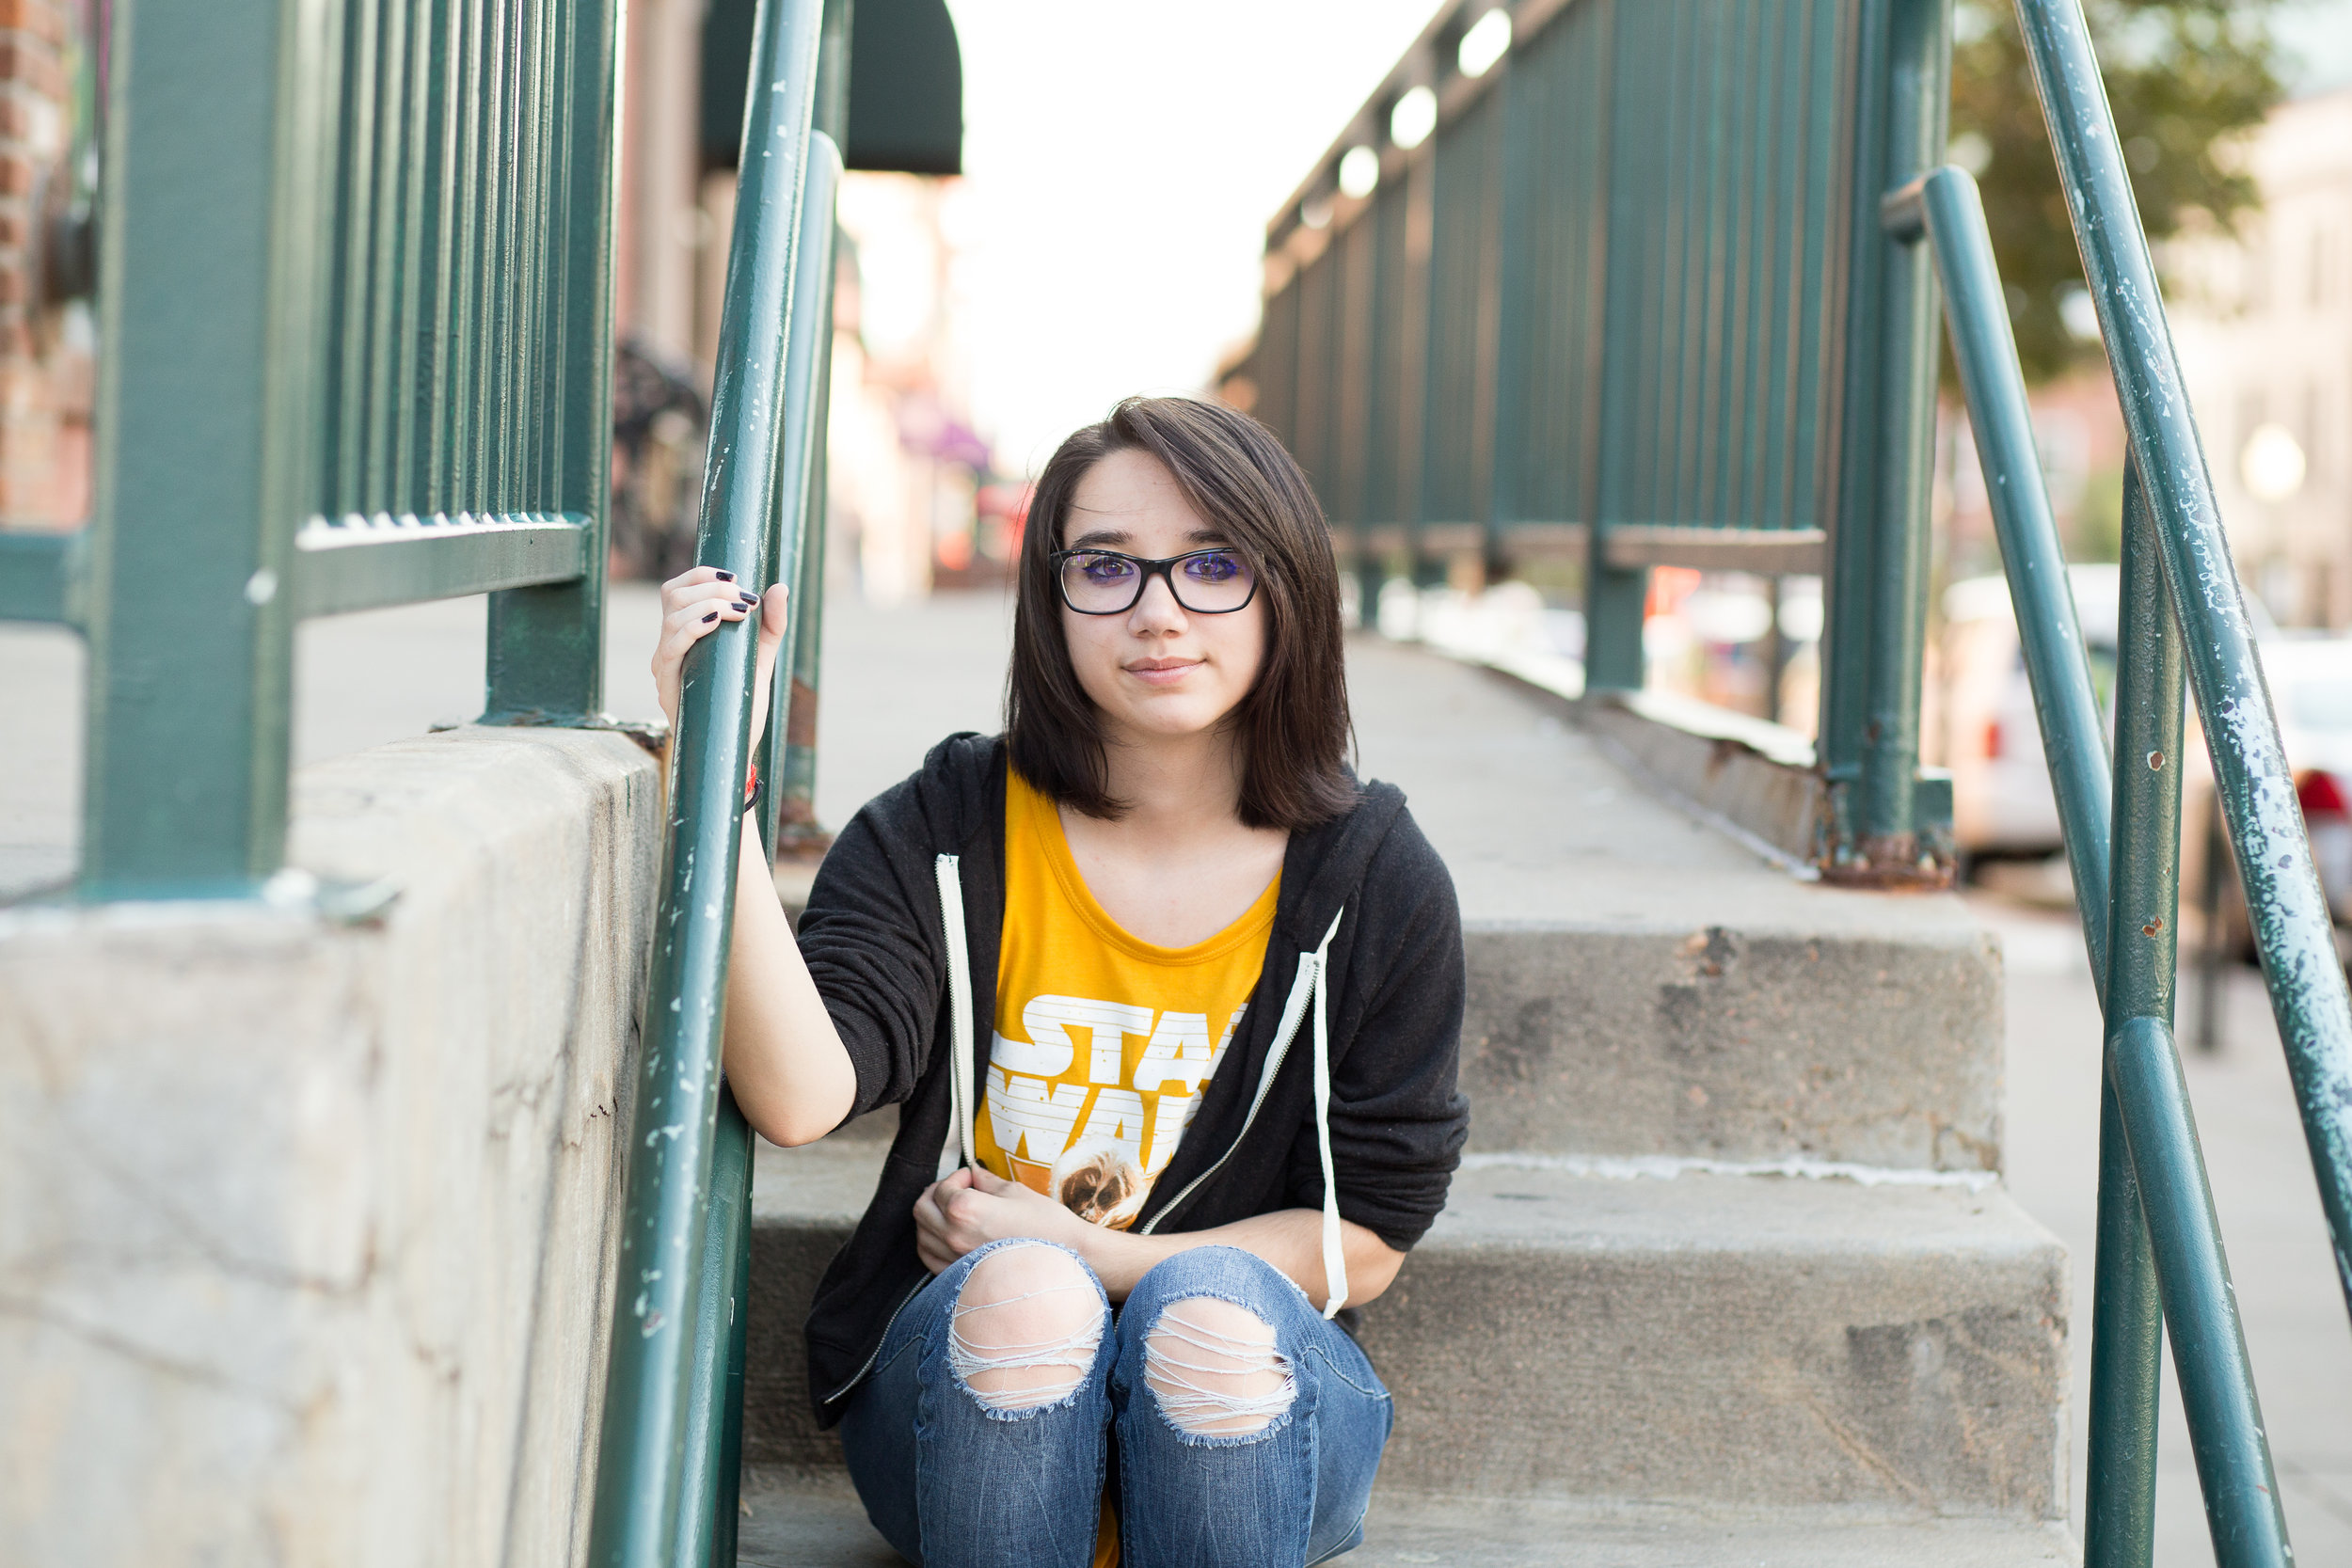 Colorado Springs Senior Photography | Colorado Springs Senior Photographer | Girl yellow shirt sitting on stairs for senior portraits | Stacy Carosa Photography